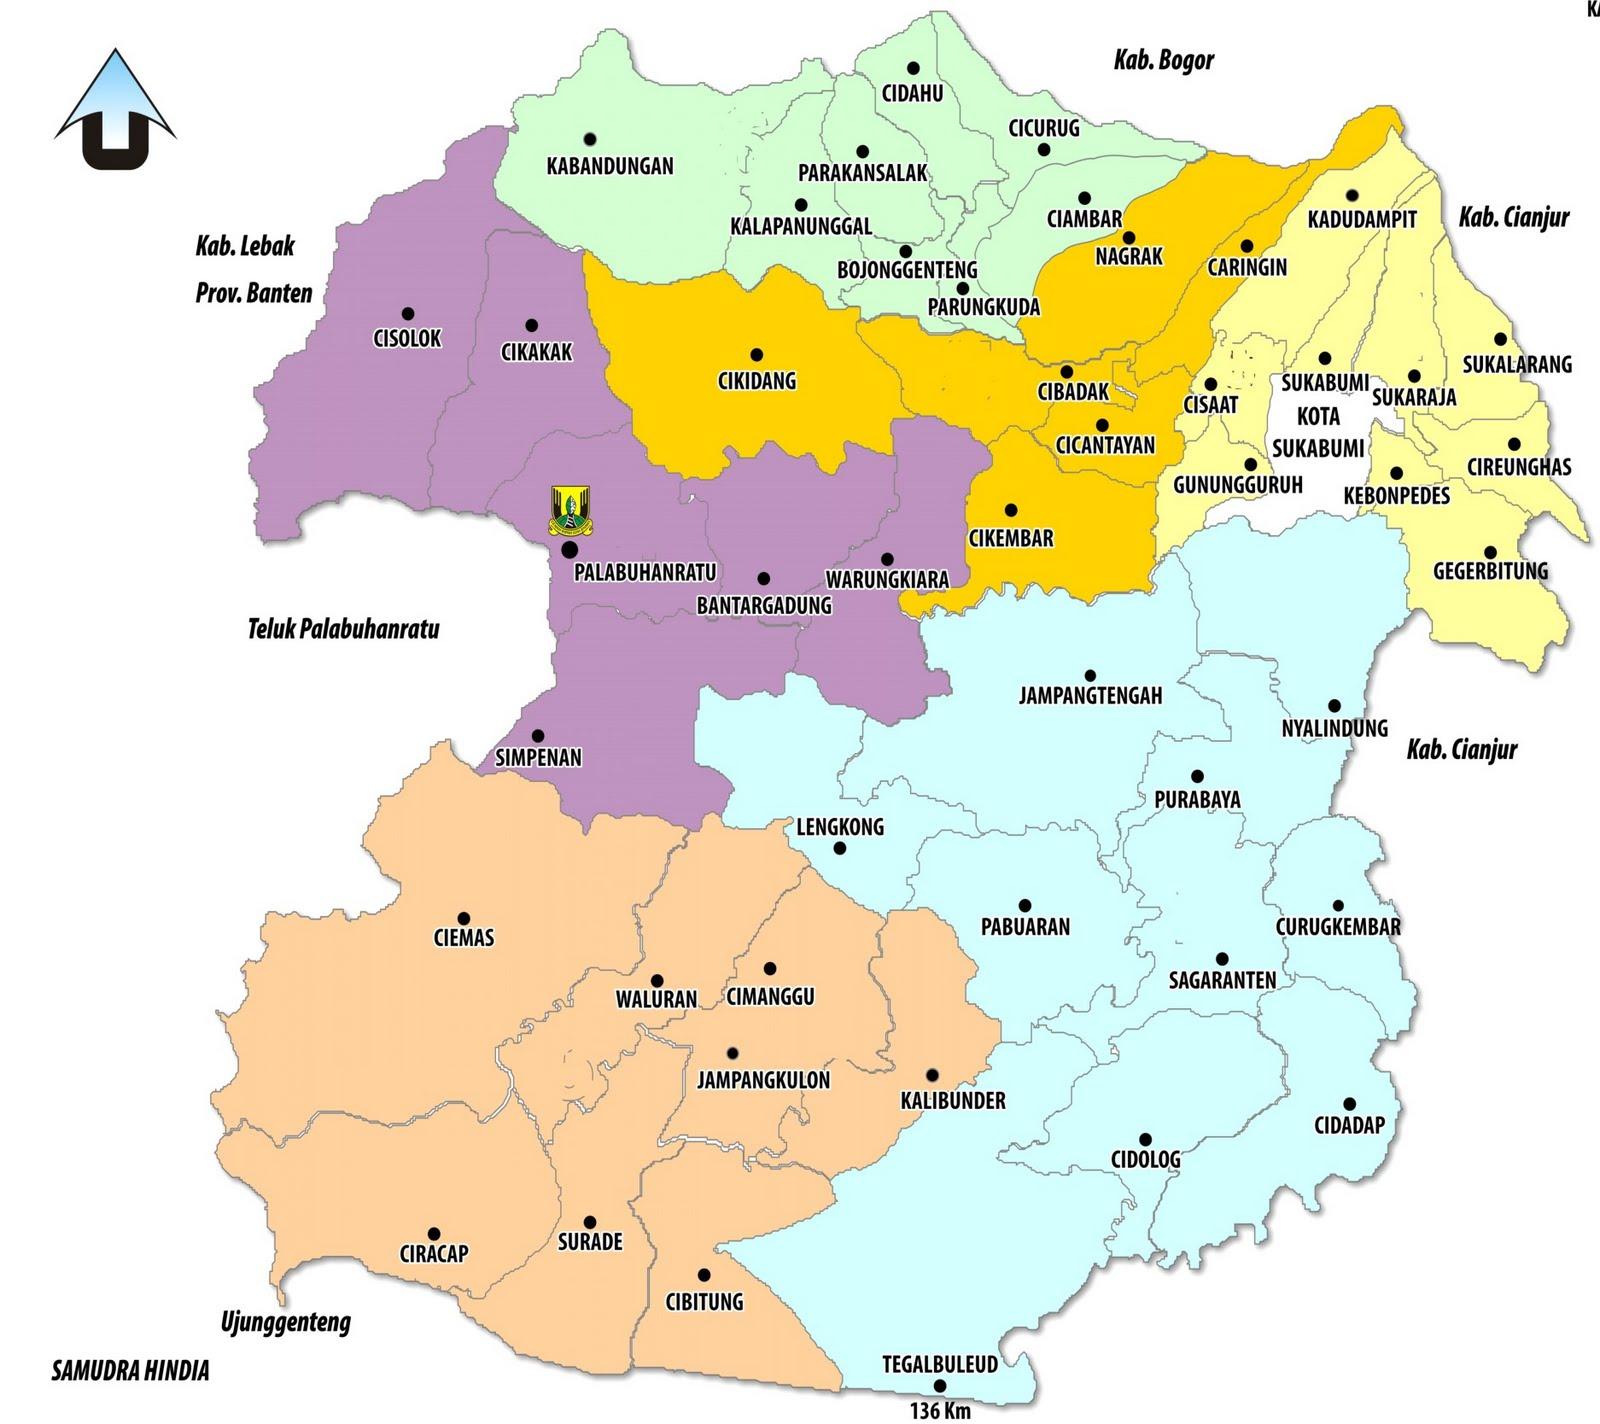 Informasi Sukabumi: Kabupaten Sukabumi